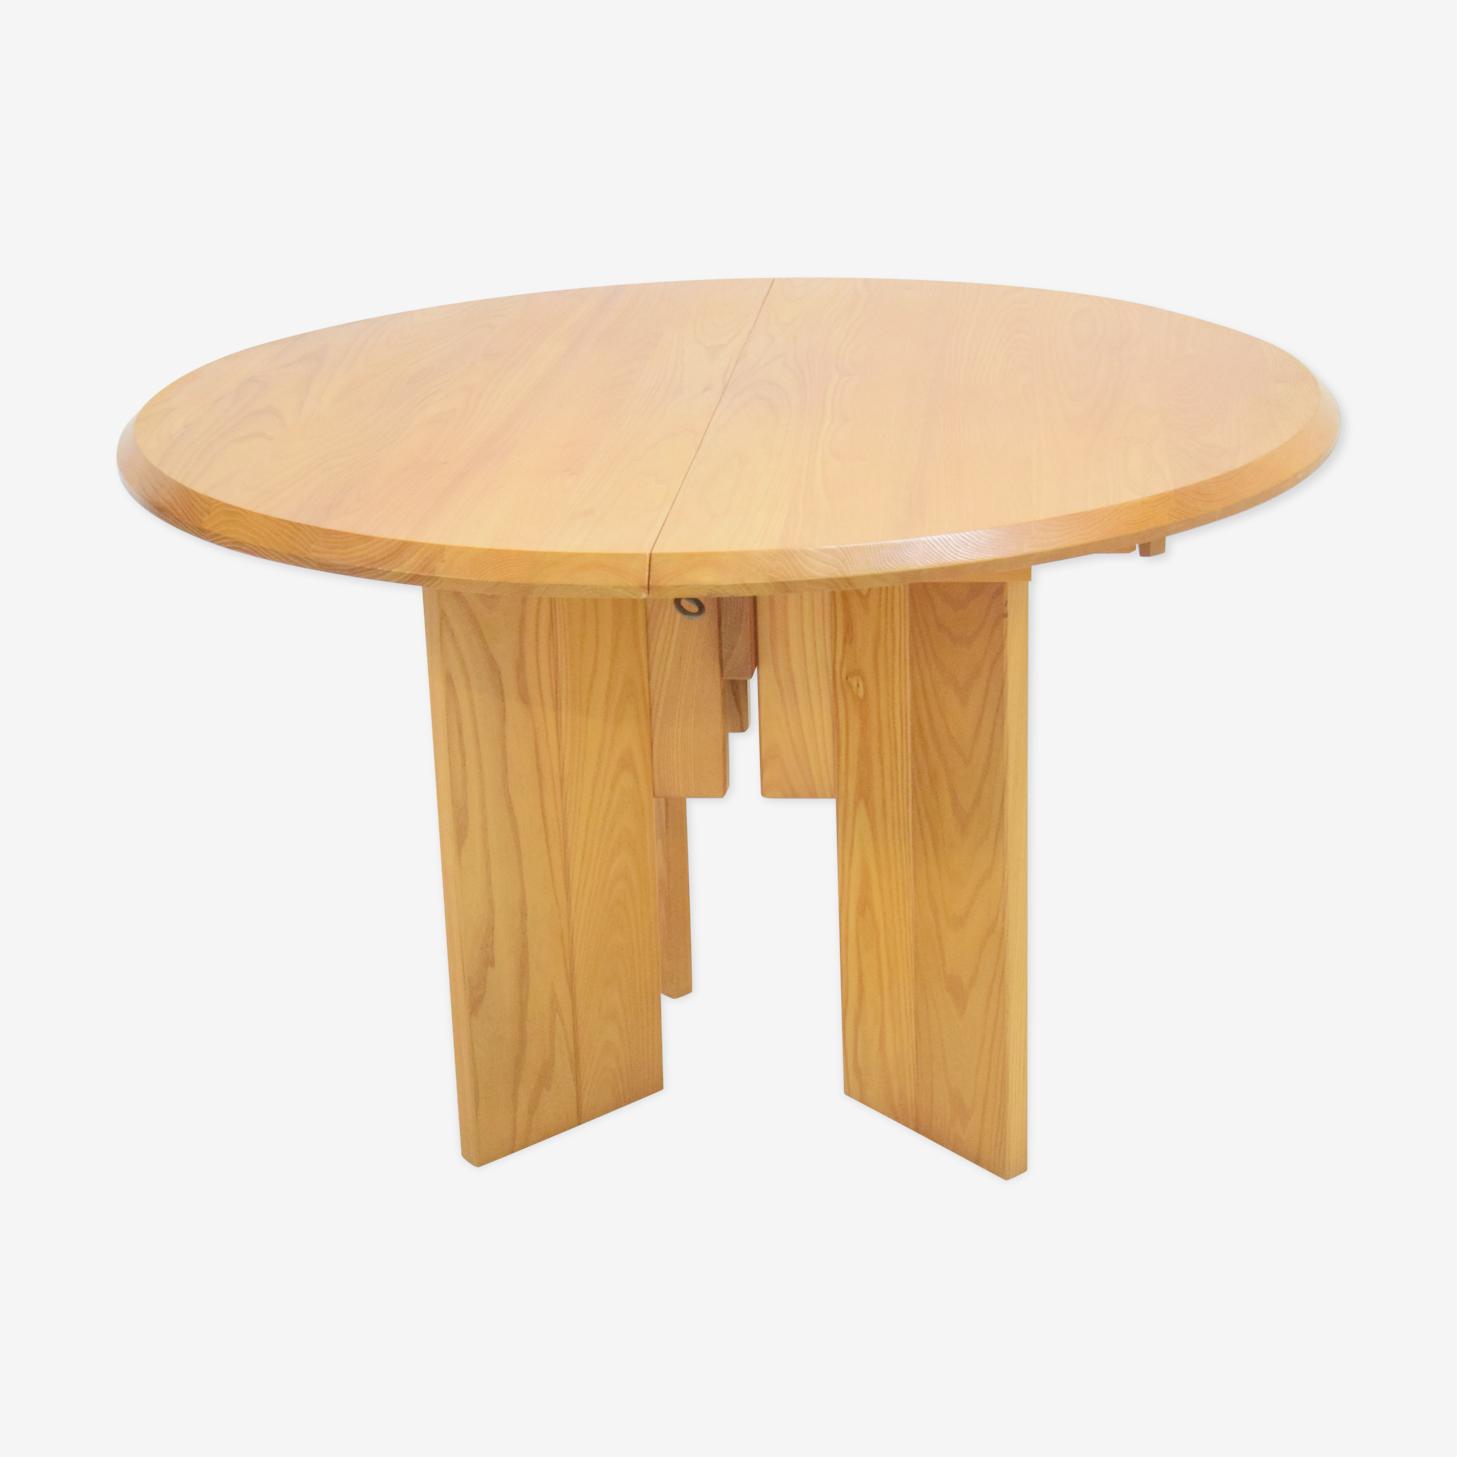 Table brand Regain years 80